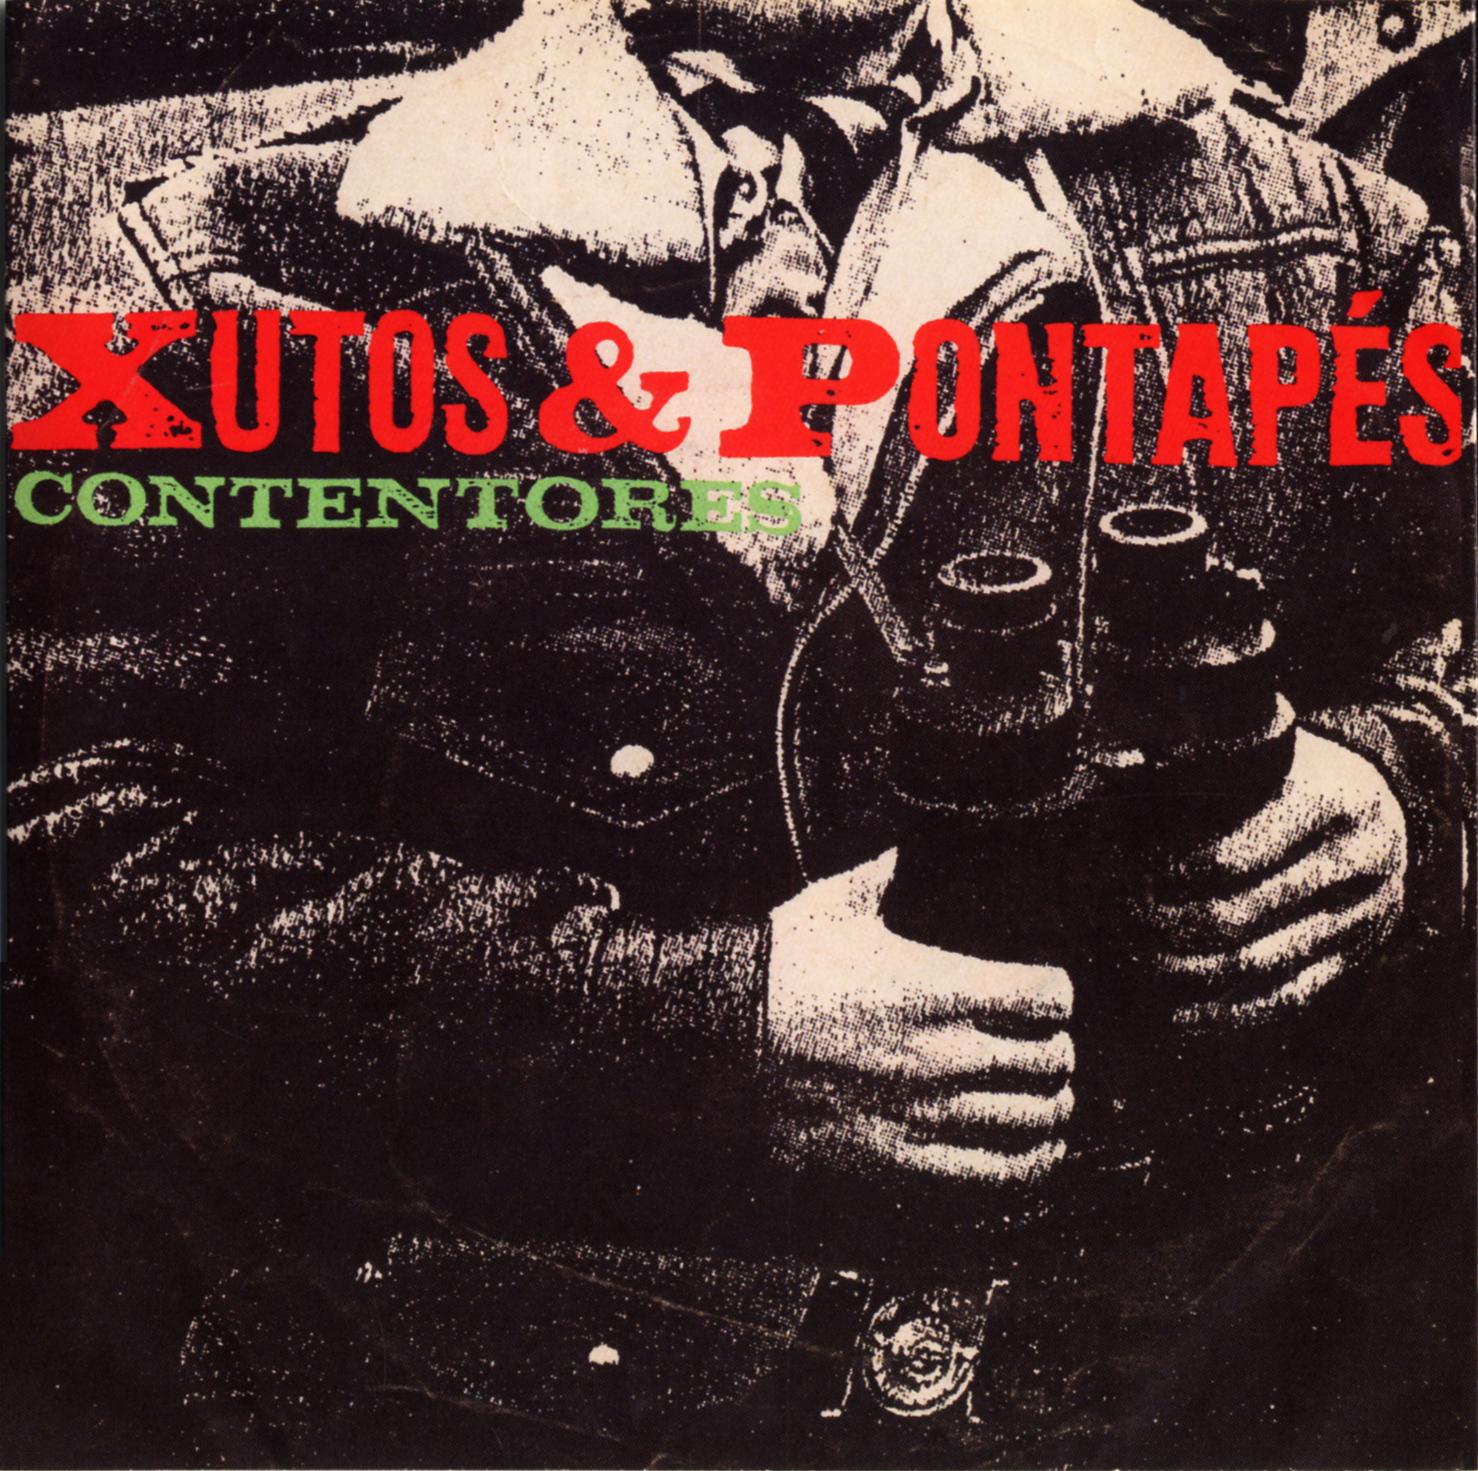 1987. Contentores